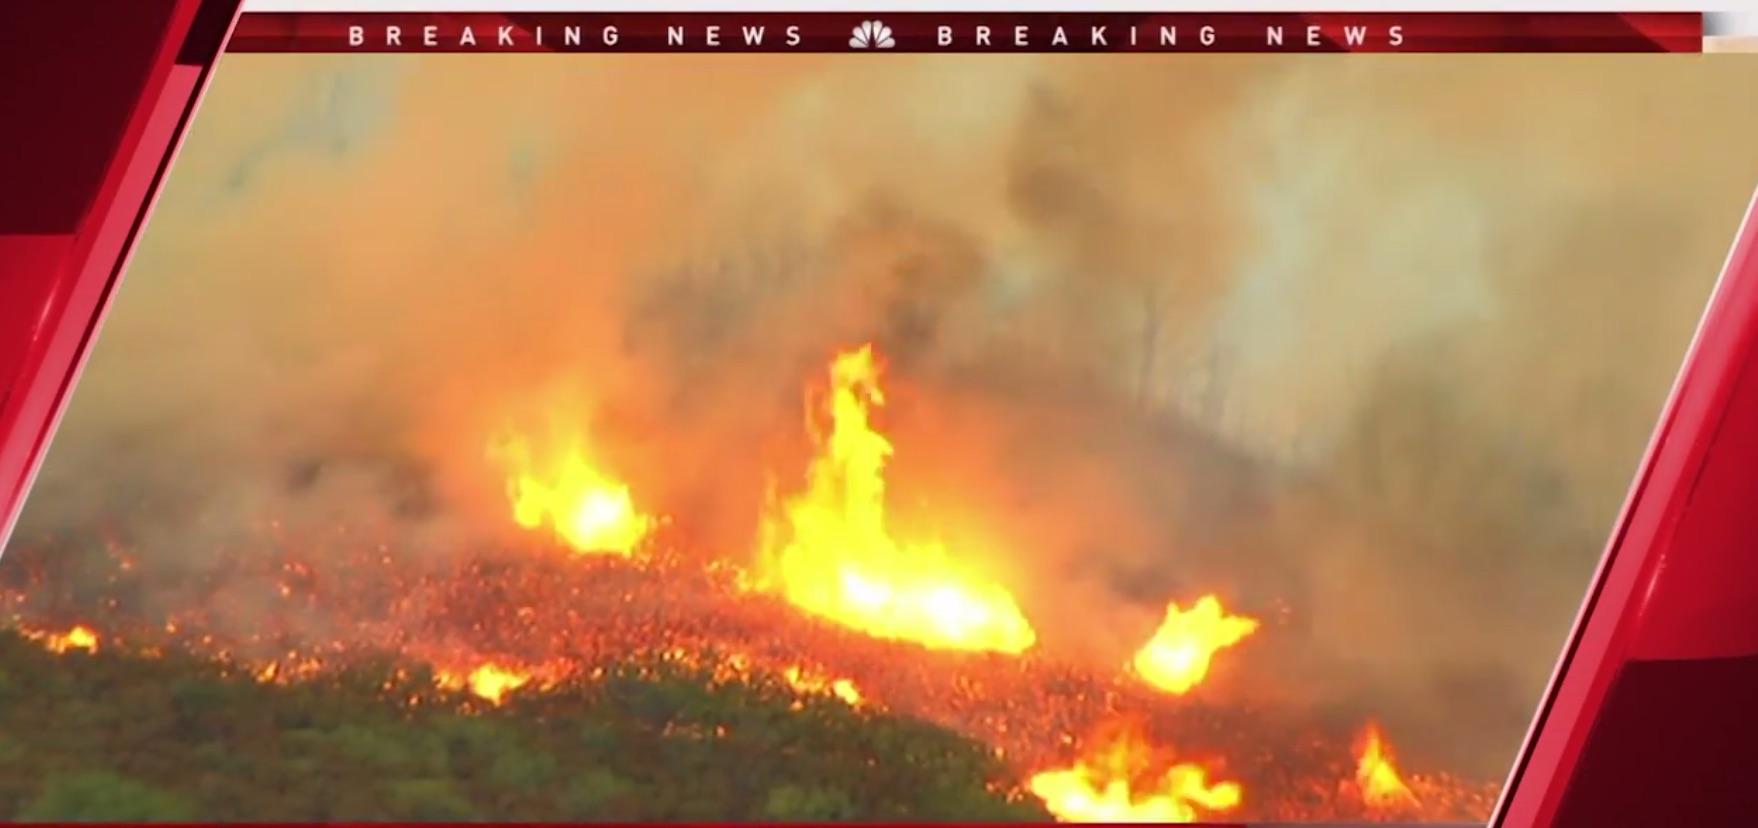 NBC Bay Area Fire Watch